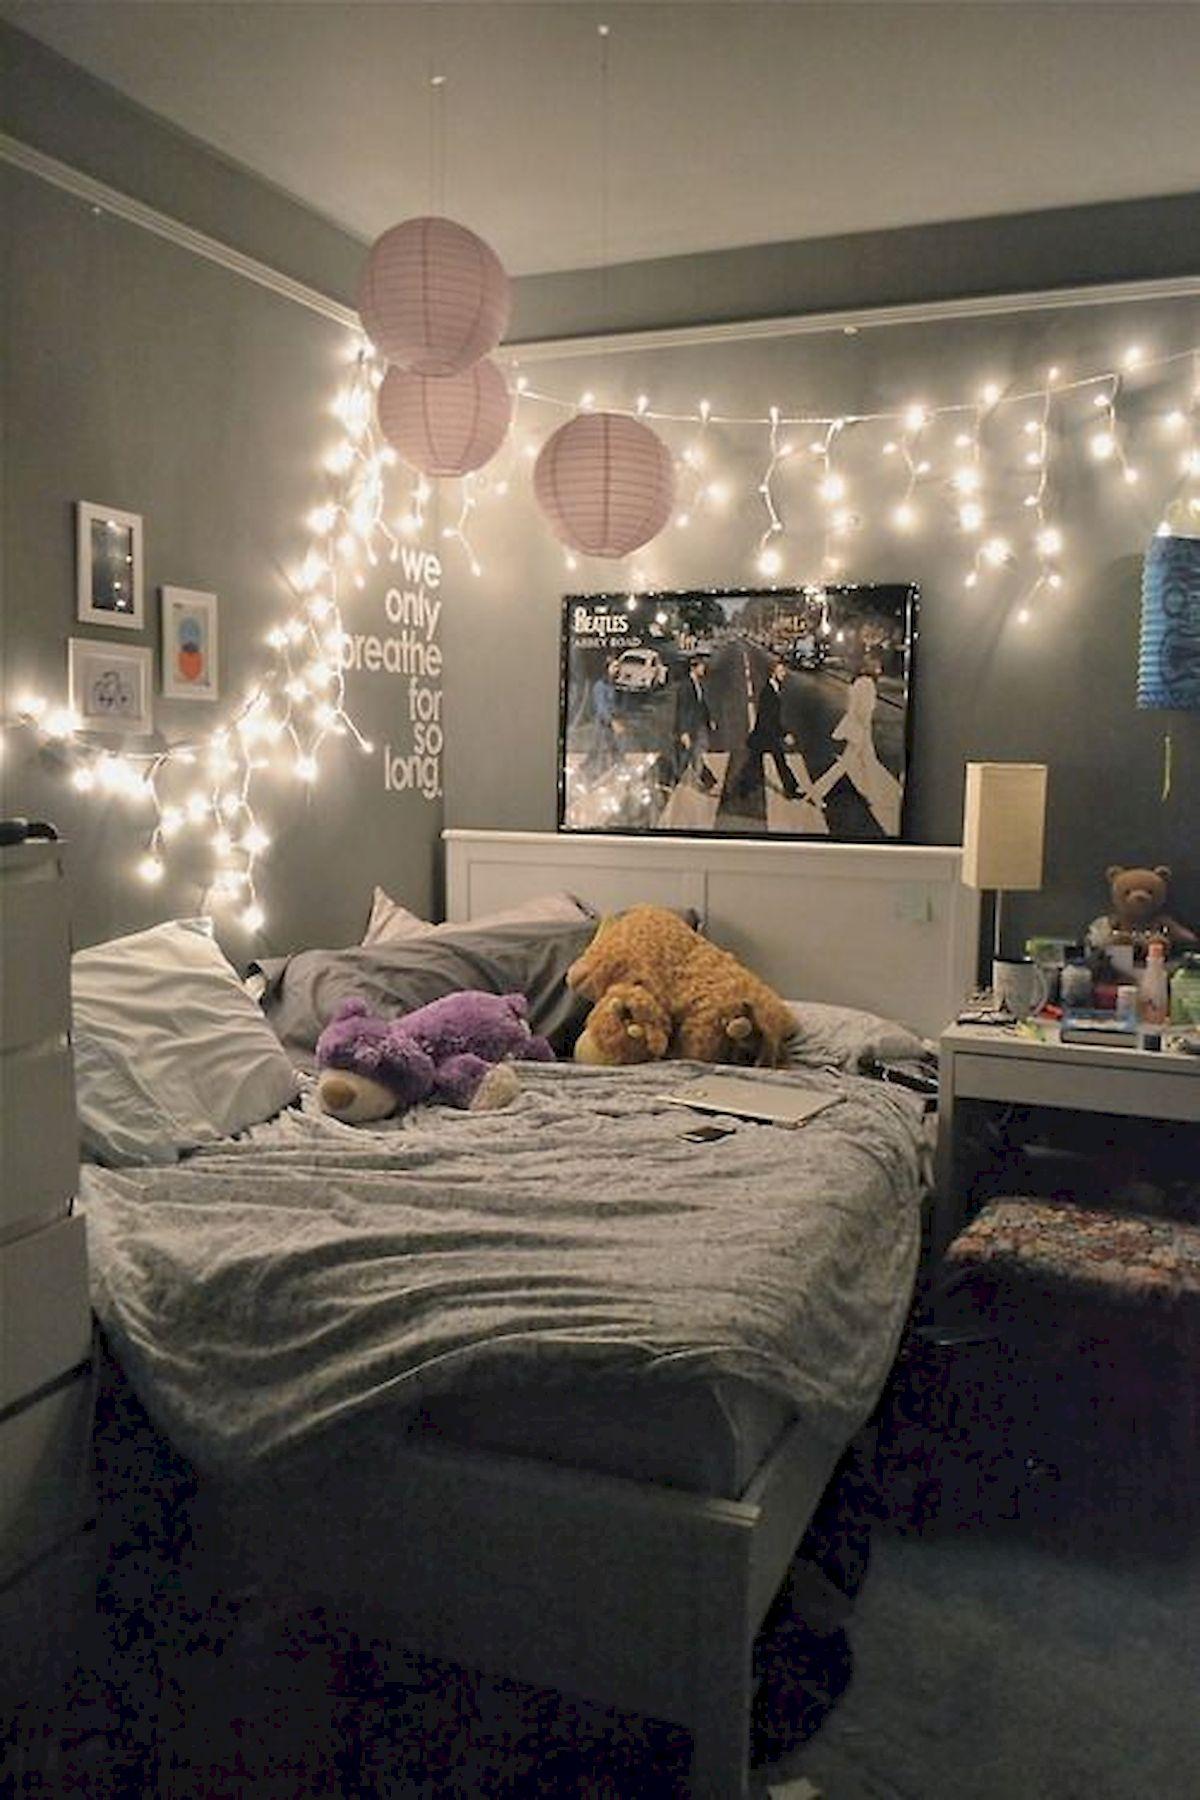 45 Beautiful Bedroom Decor Ideas for Teens (13)